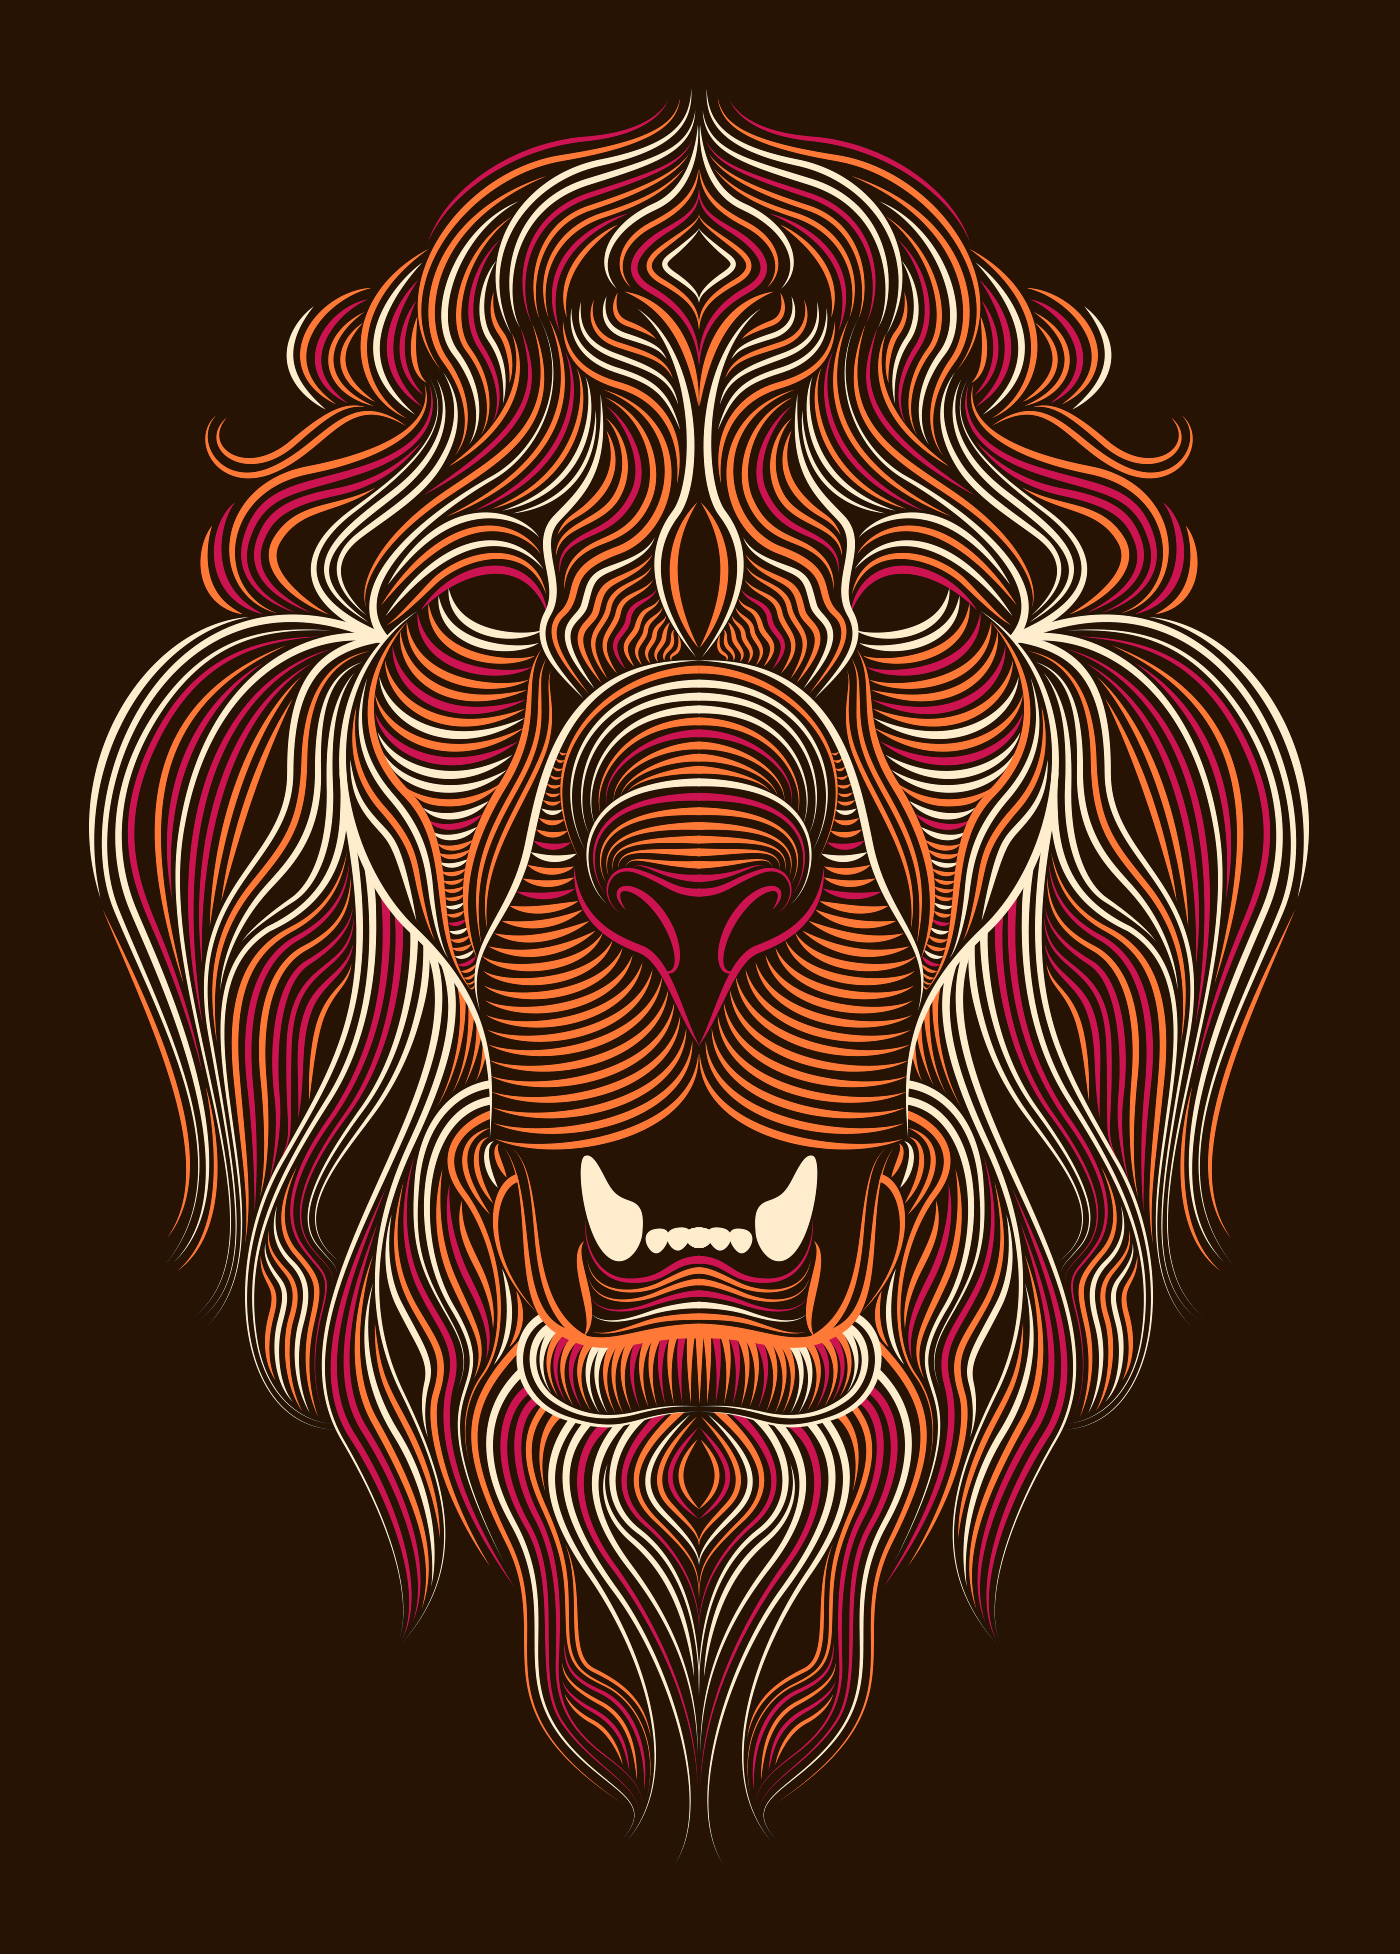 Adobe Illustrator Cc On Behance